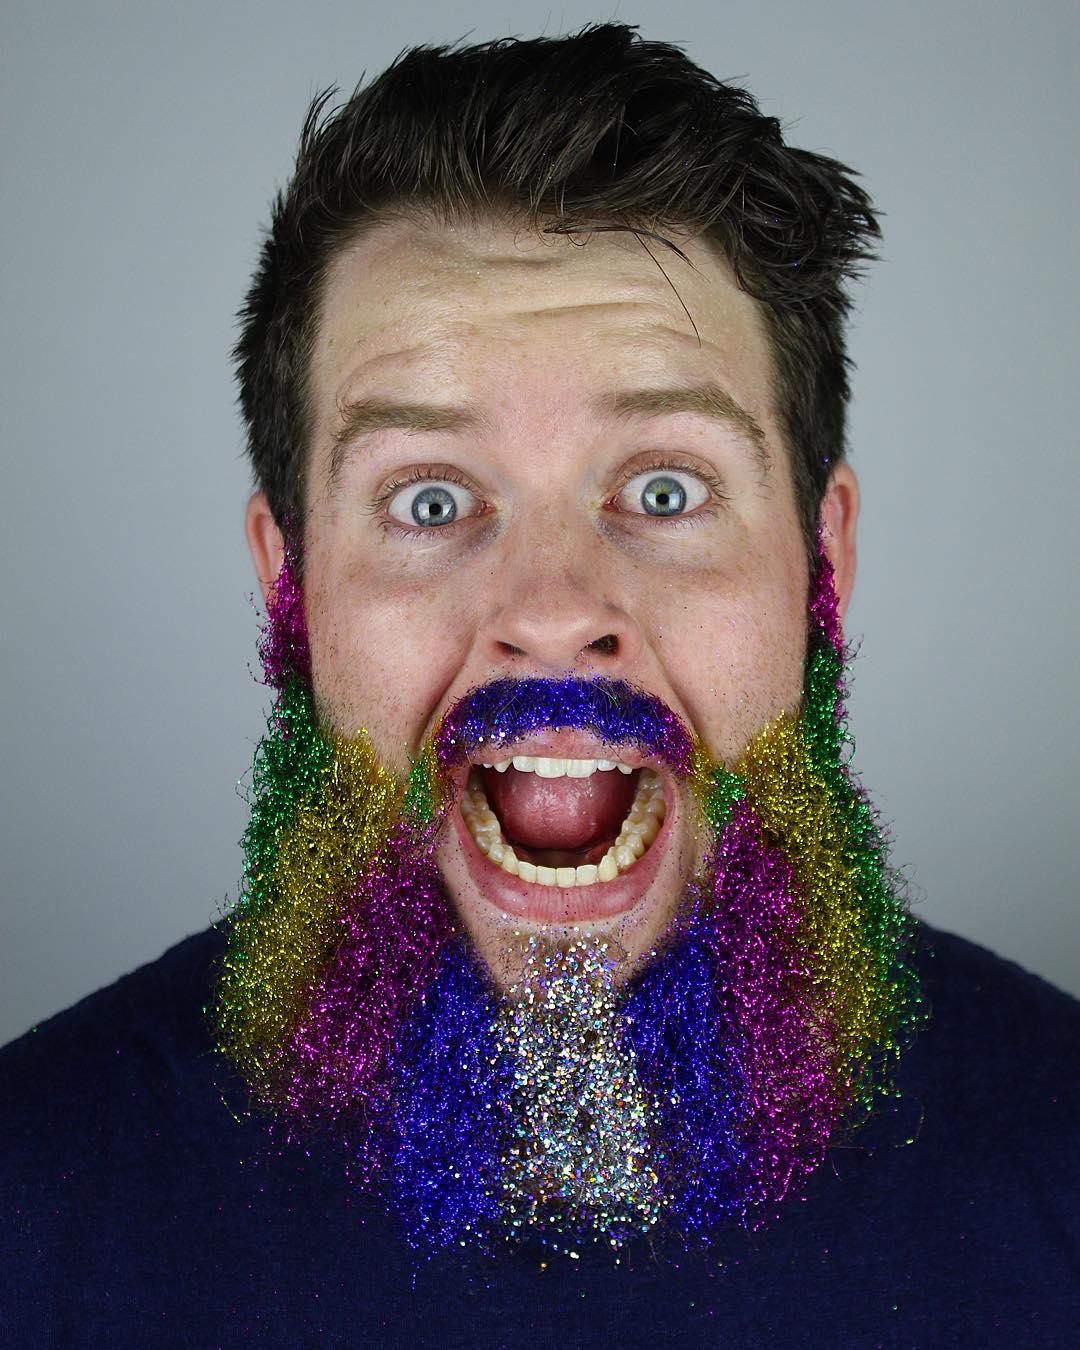 13 spectacular glitter beards on instagram her beauty 13spectacularglitterbeardsoninstagram02 rainbow glitter beard solutioingenieria Gallery